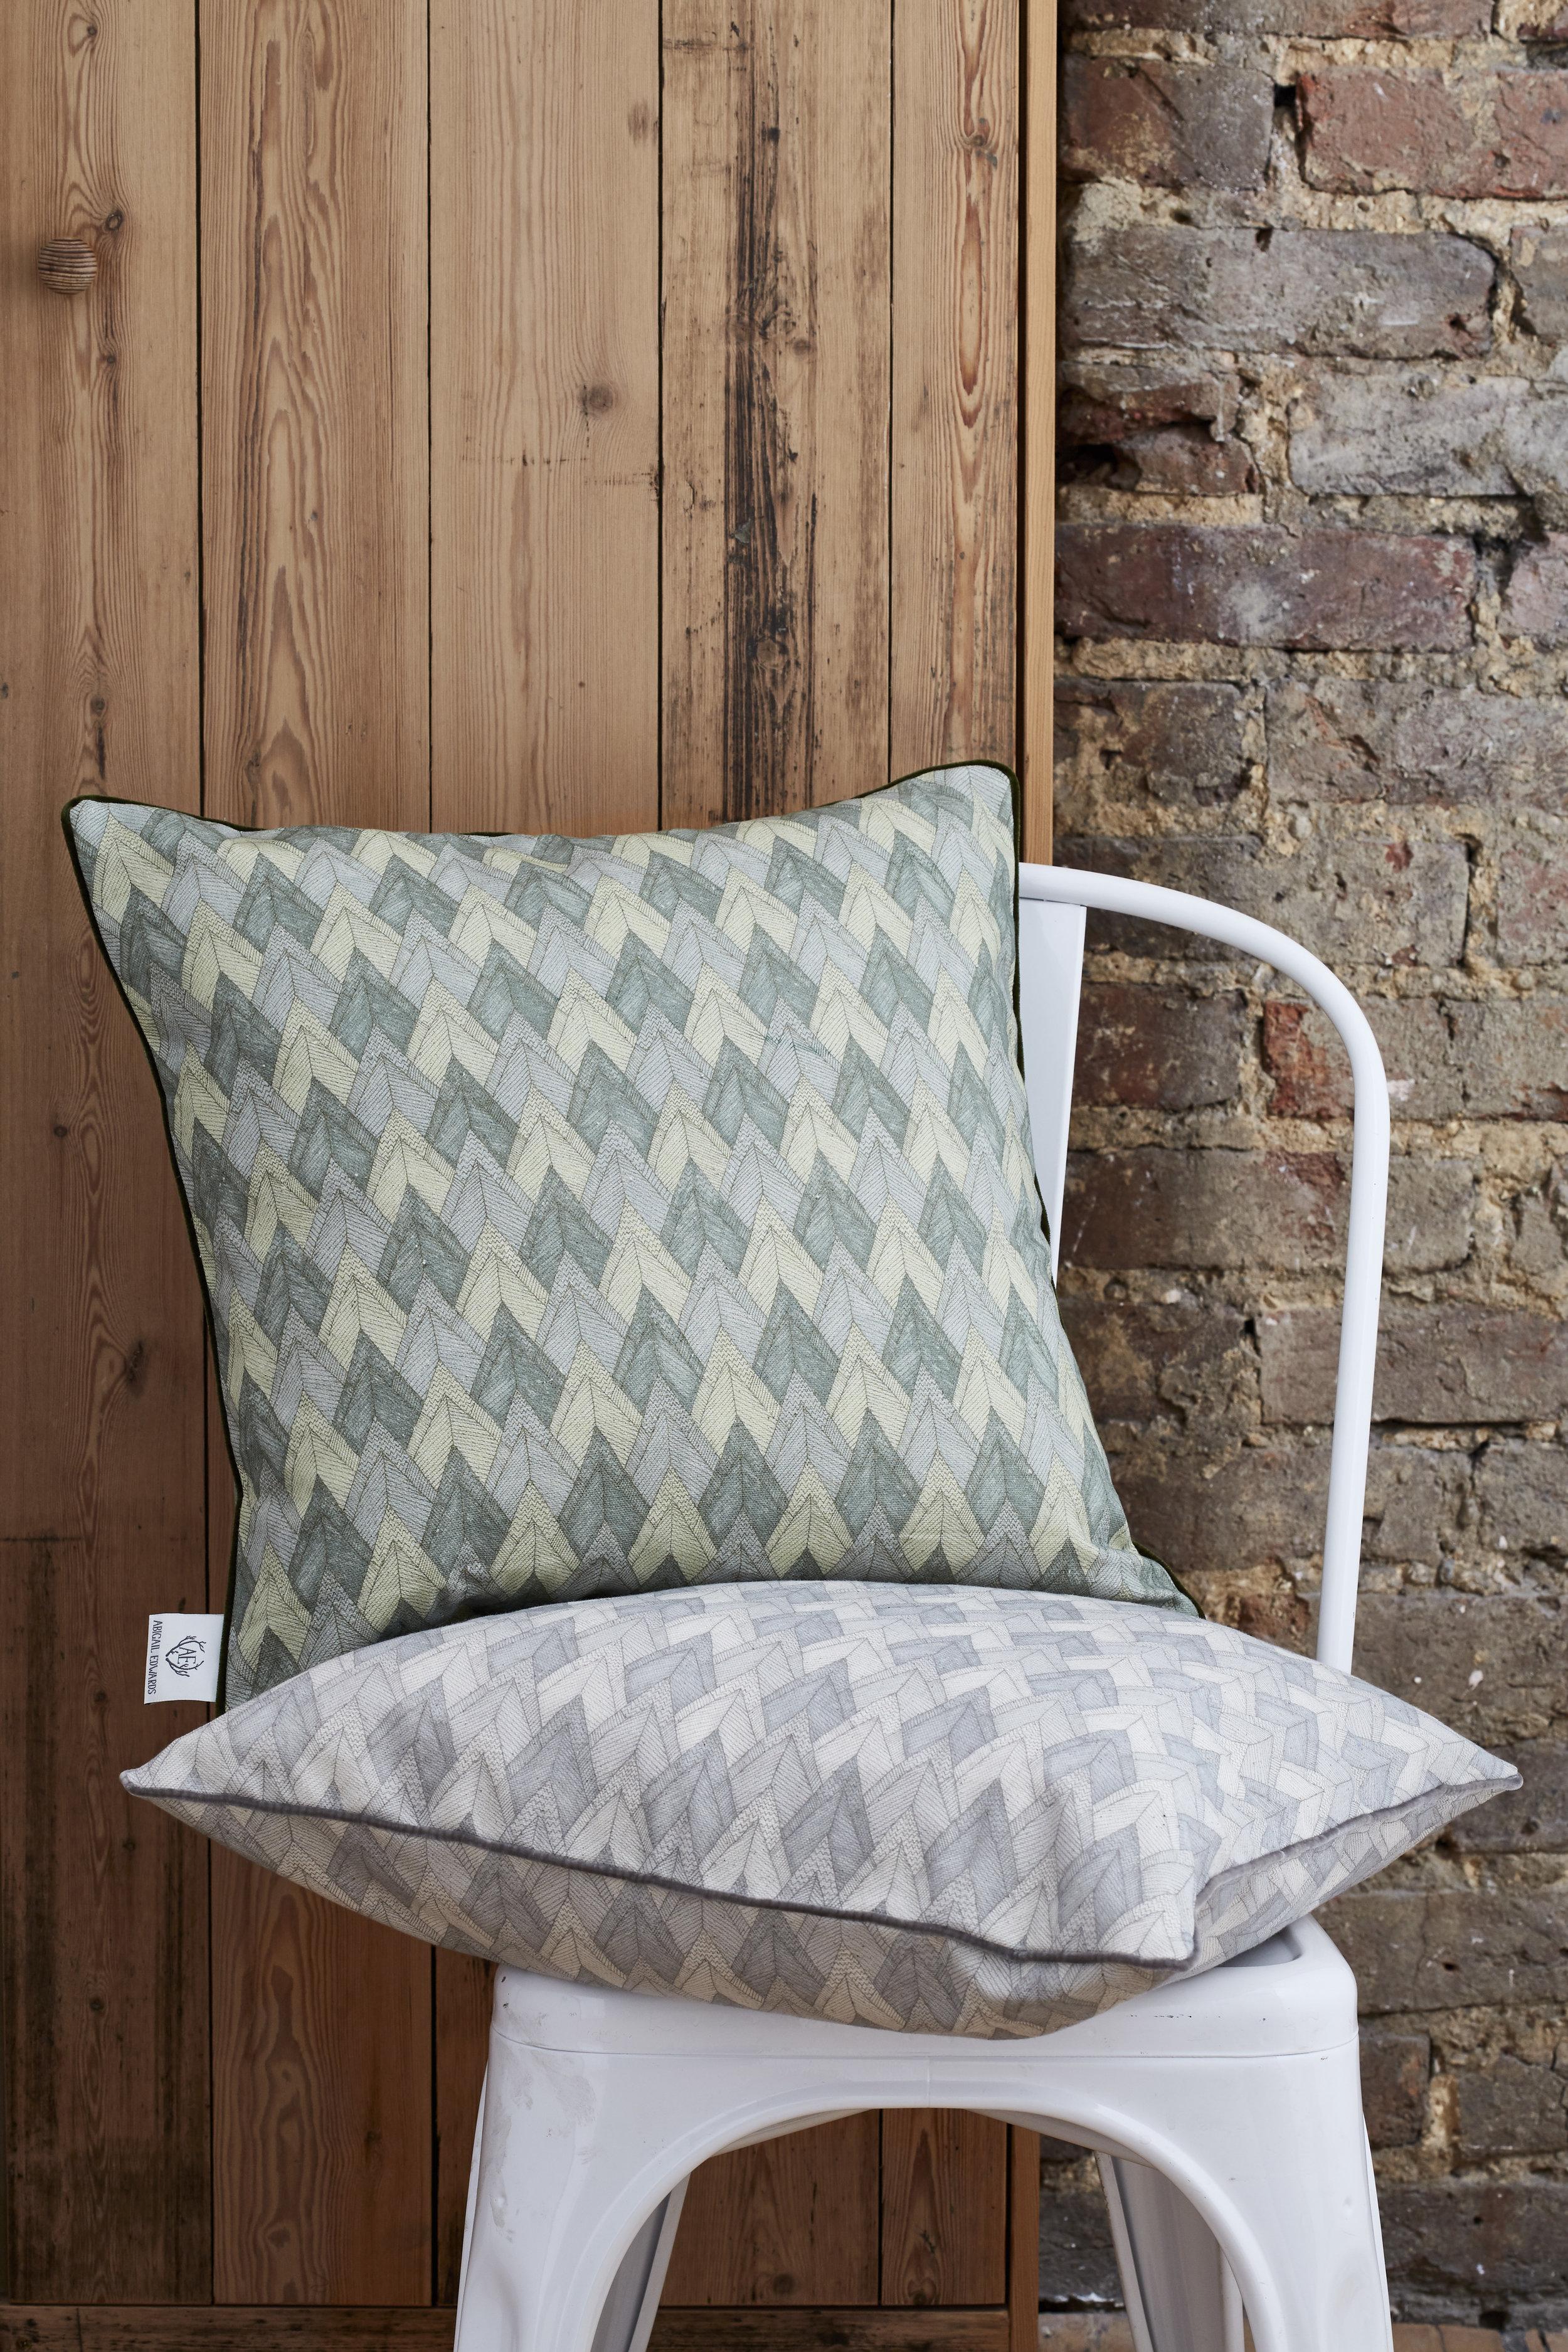 Abigail Edwards NEW Mountainous Cushion in Forest & Mountain, £95.jpg